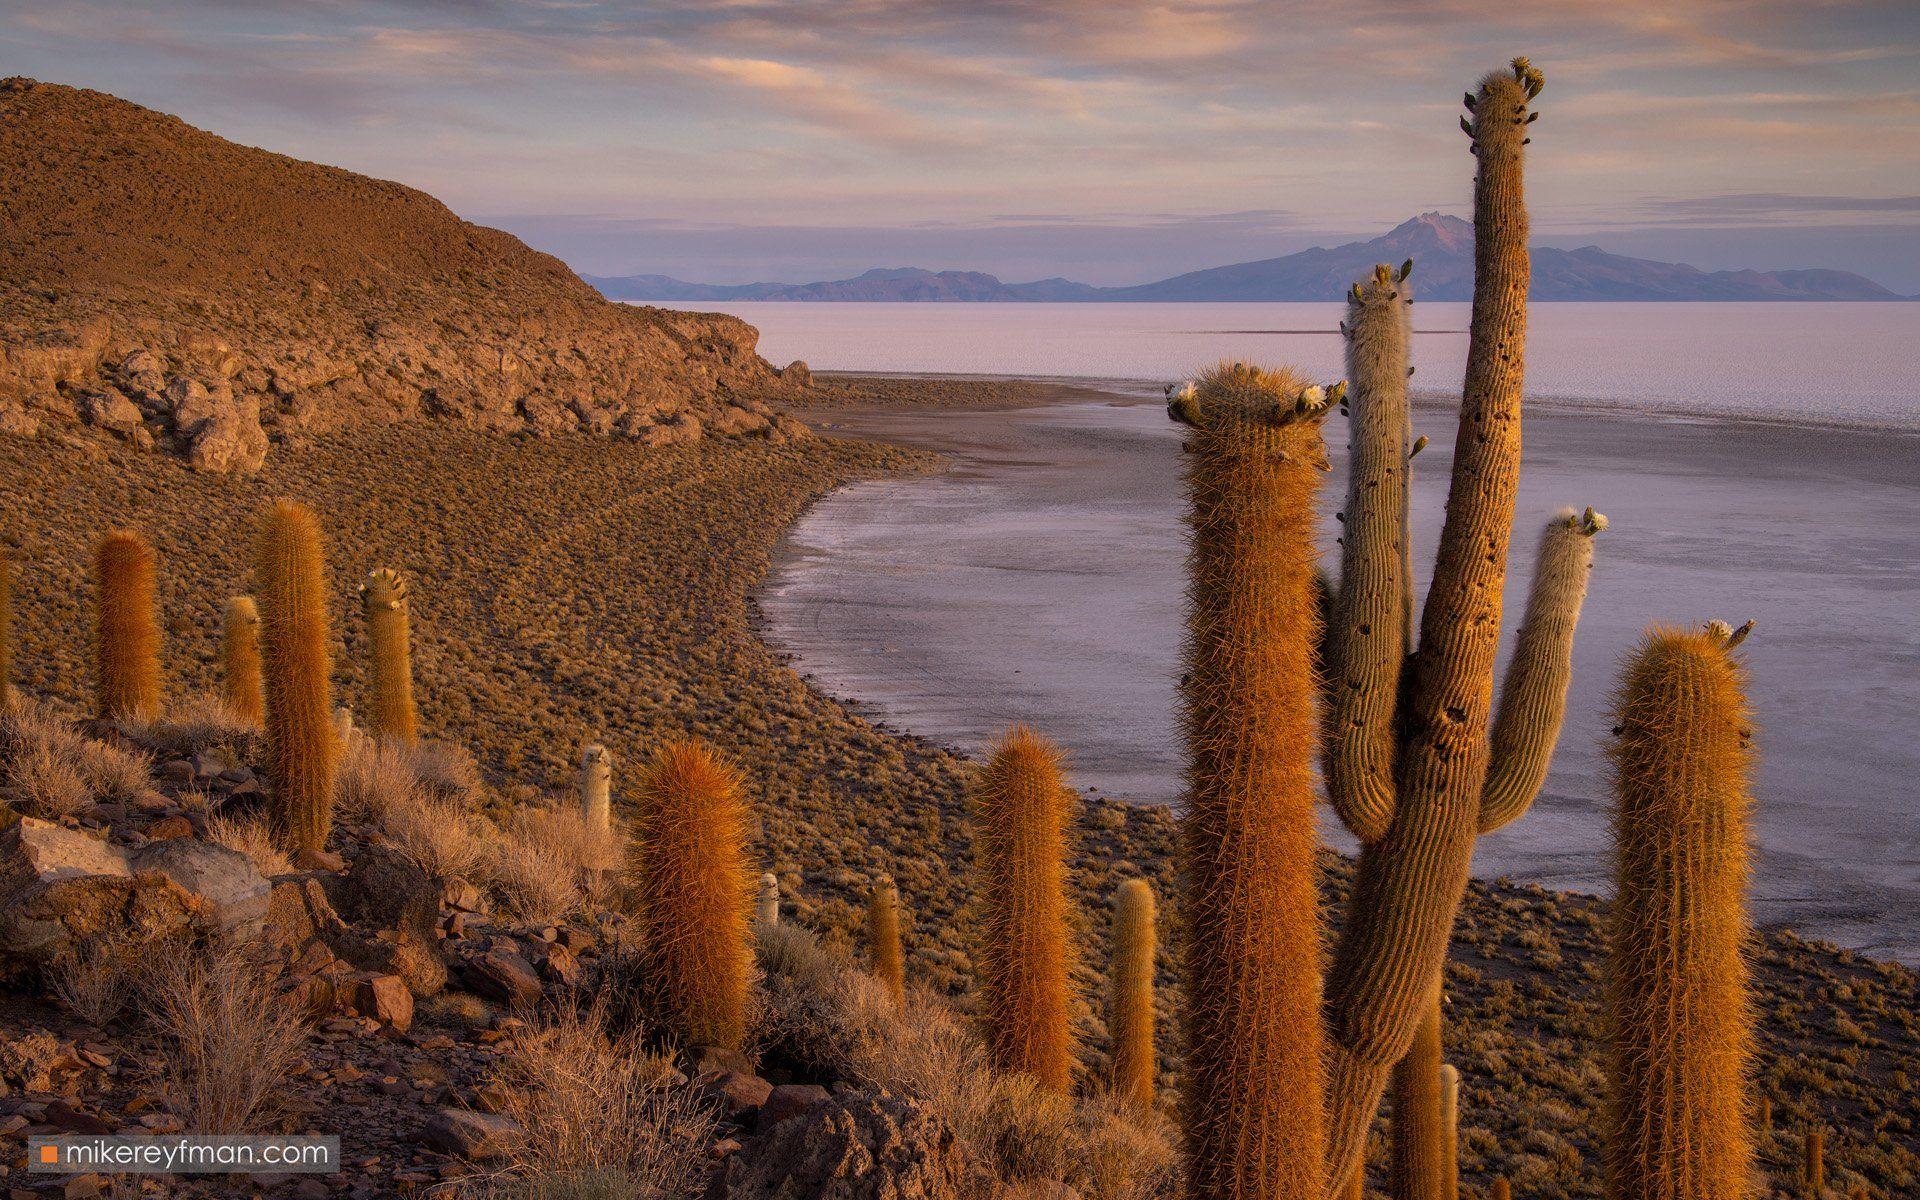 uyuni, bolivia, andes, andesmountains, cactus , southamerica, indigenous, desert, Майк Рейфман